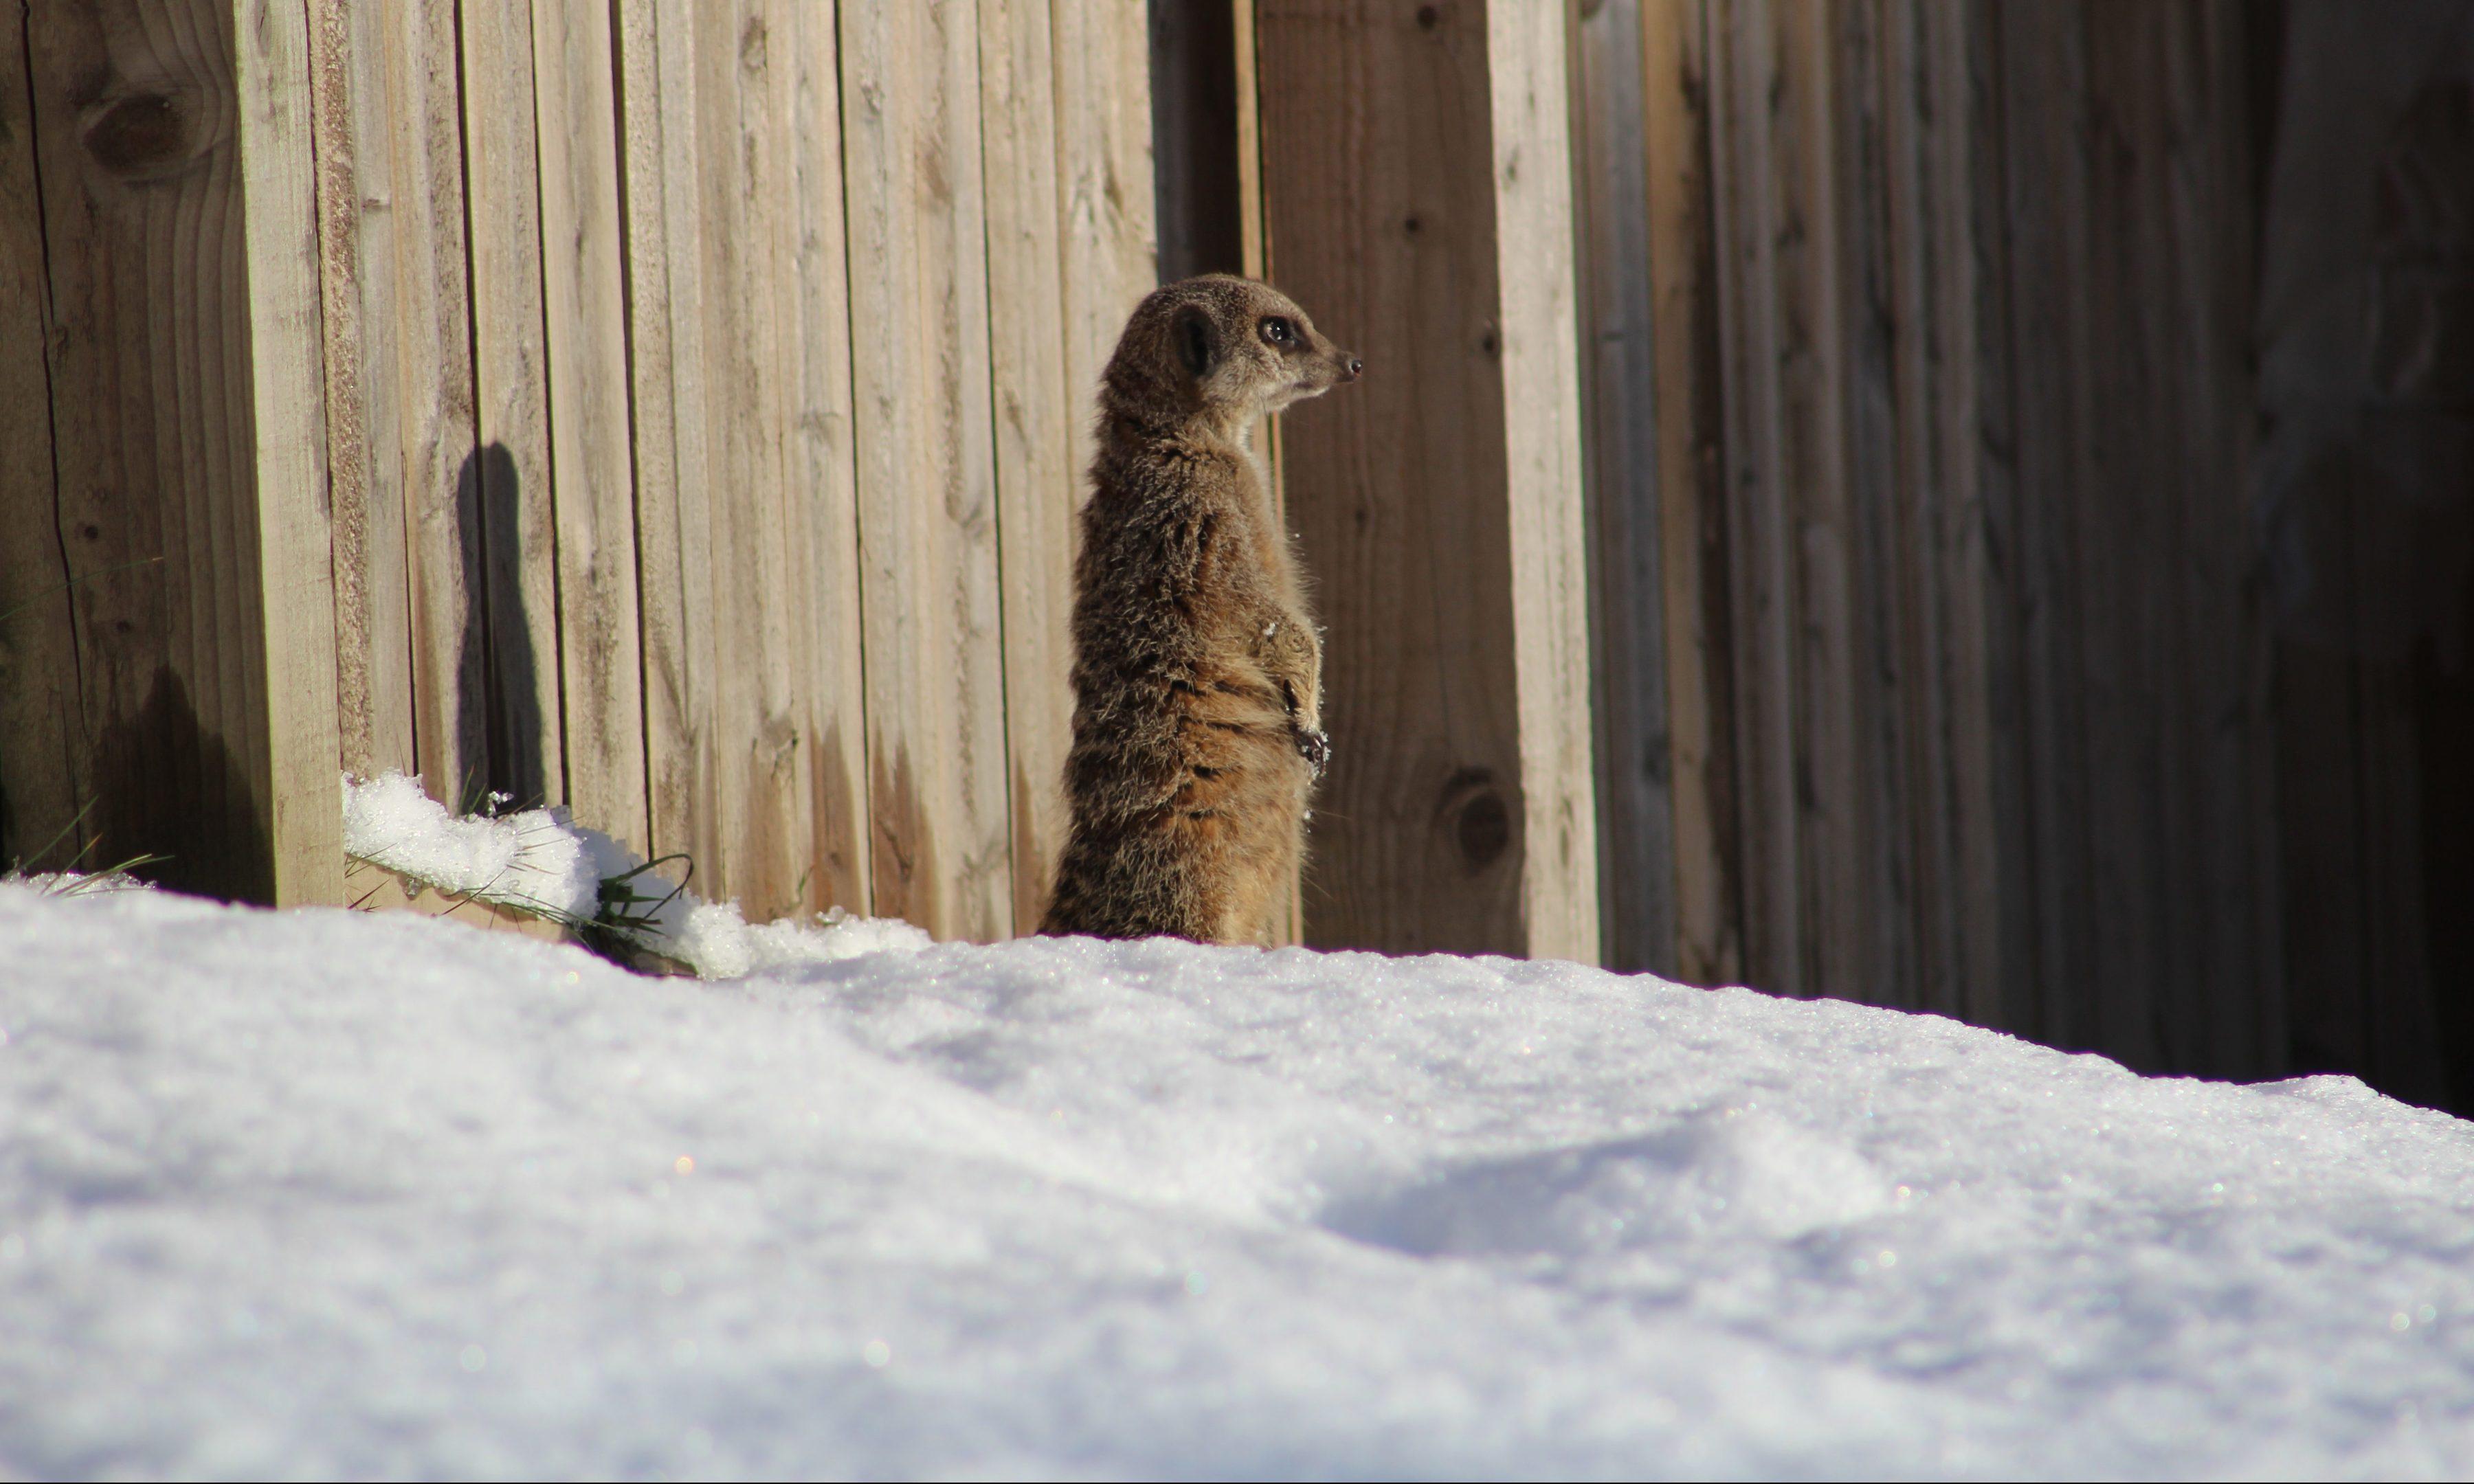 A meerkat enjoying snow at Camperdown.